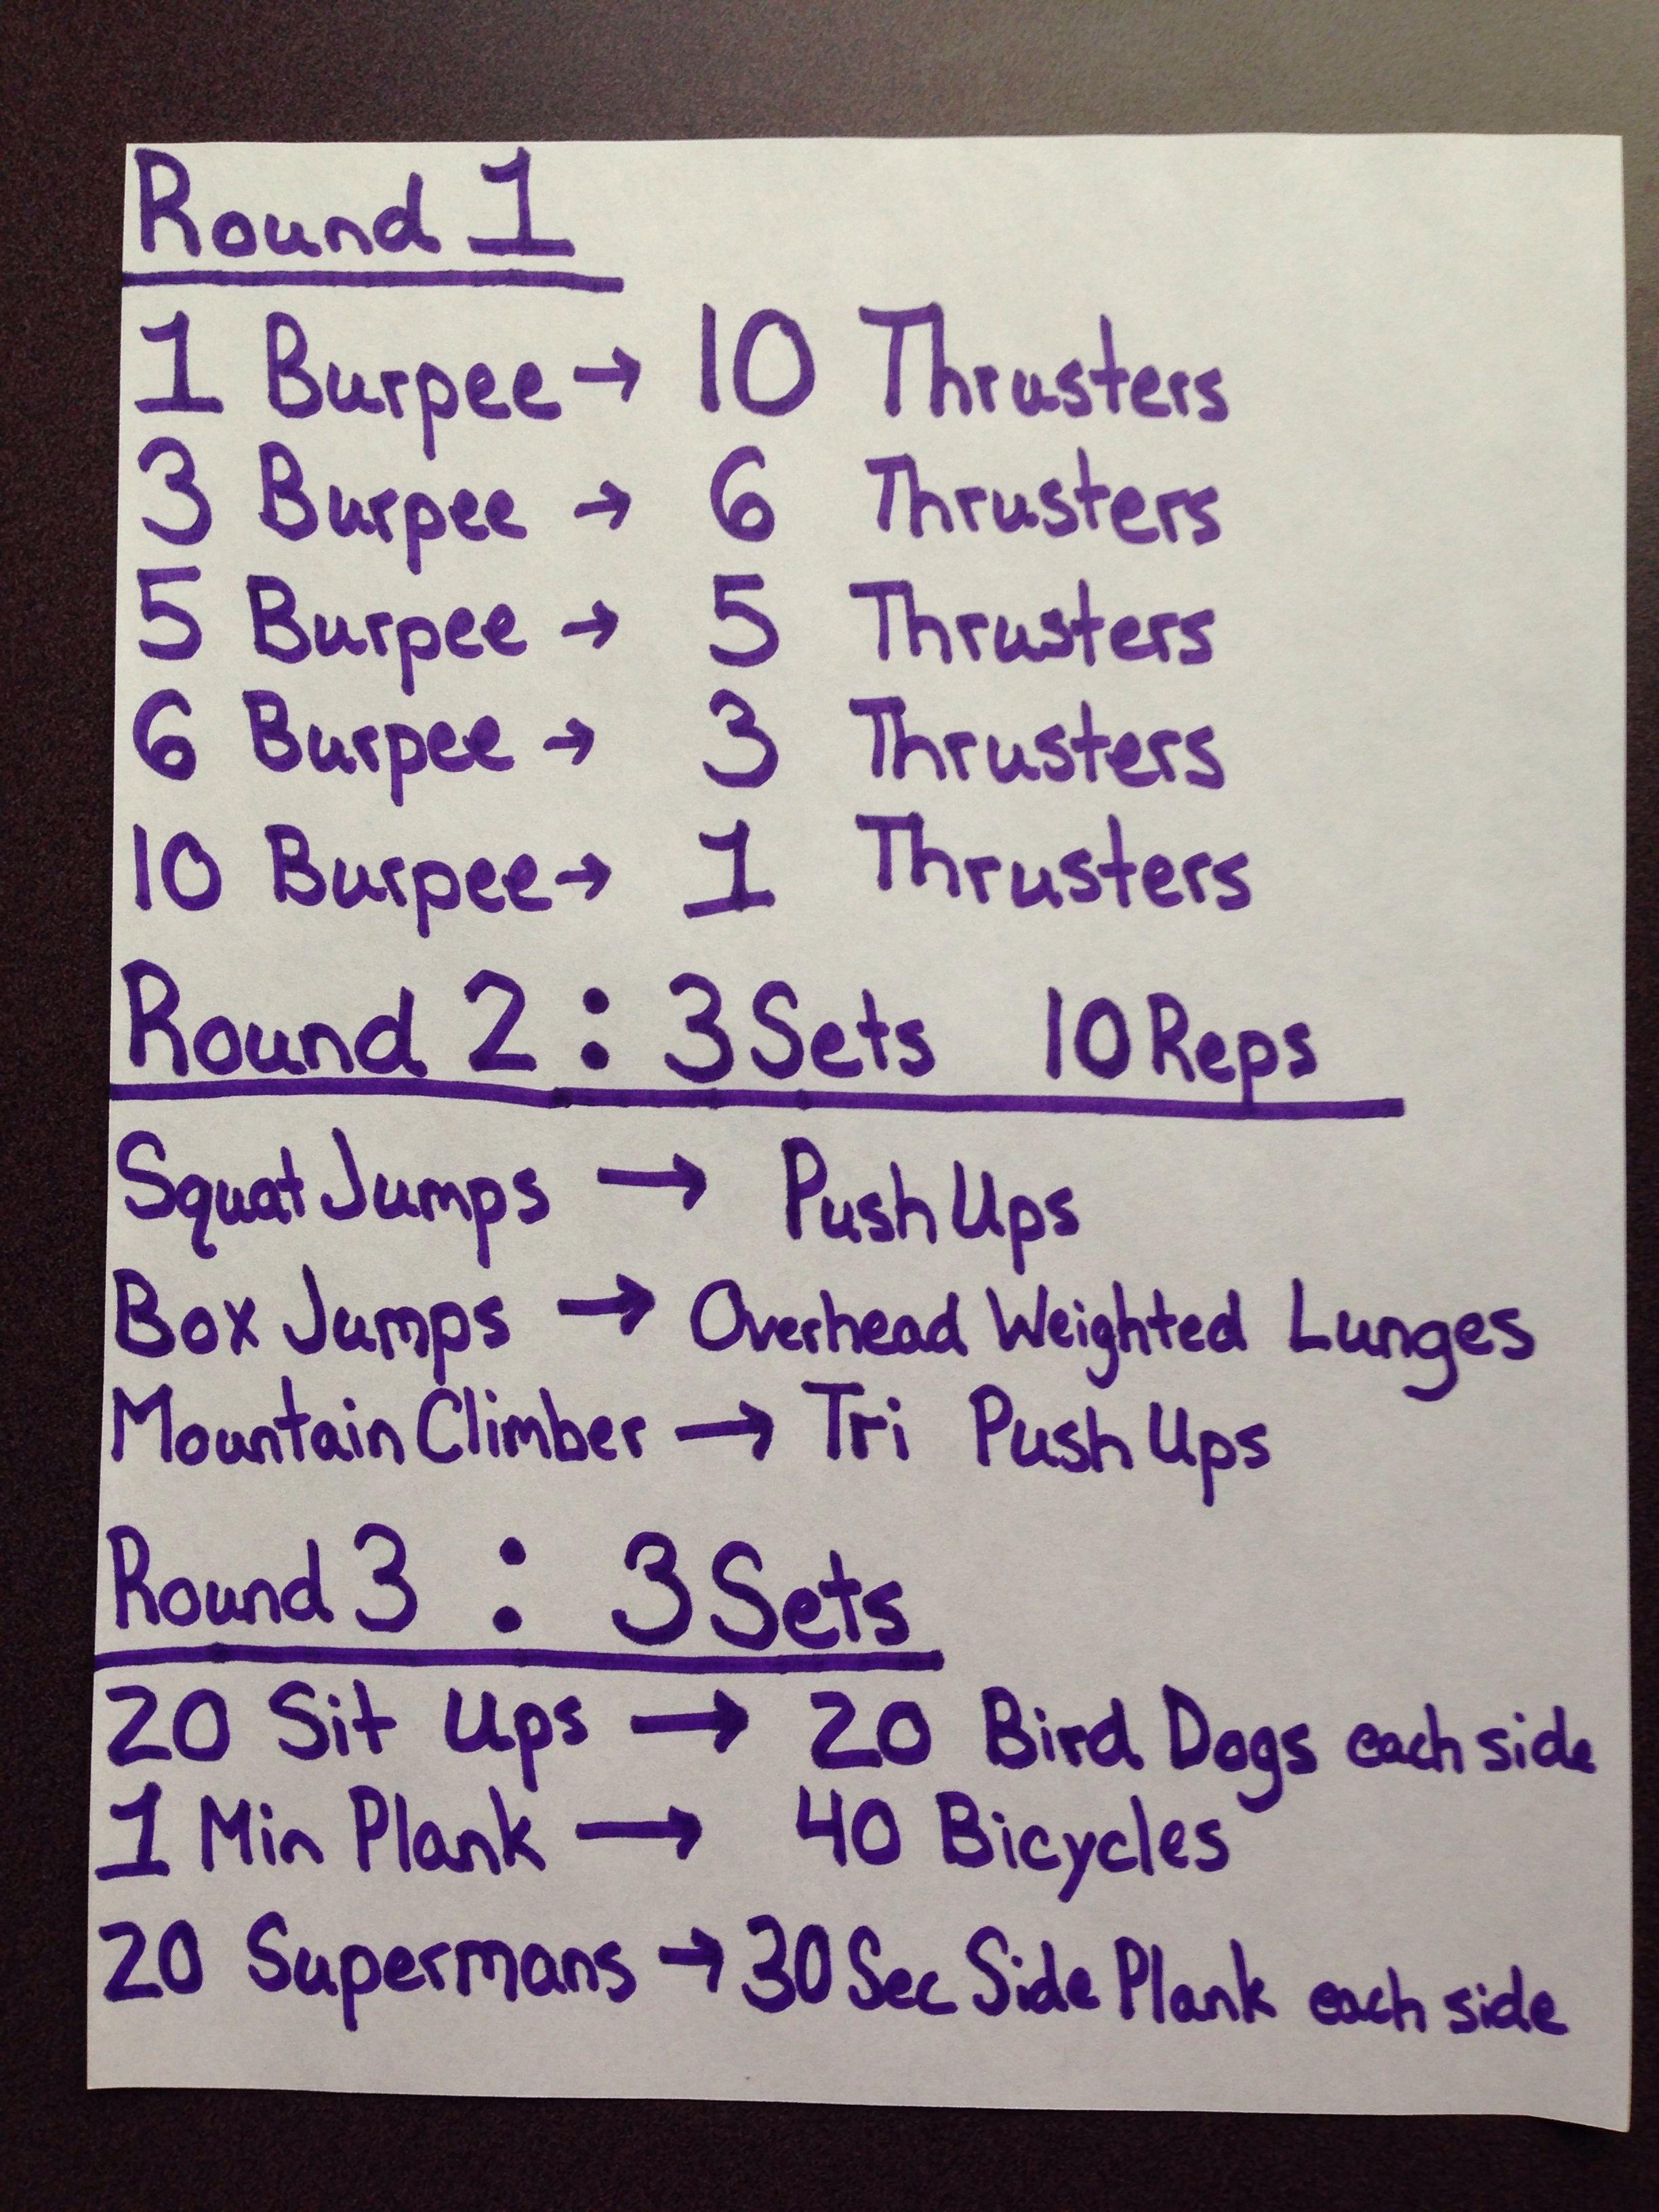 Circuito Hiit En Casa : Hiit crossfit at home workout abs ejercicios